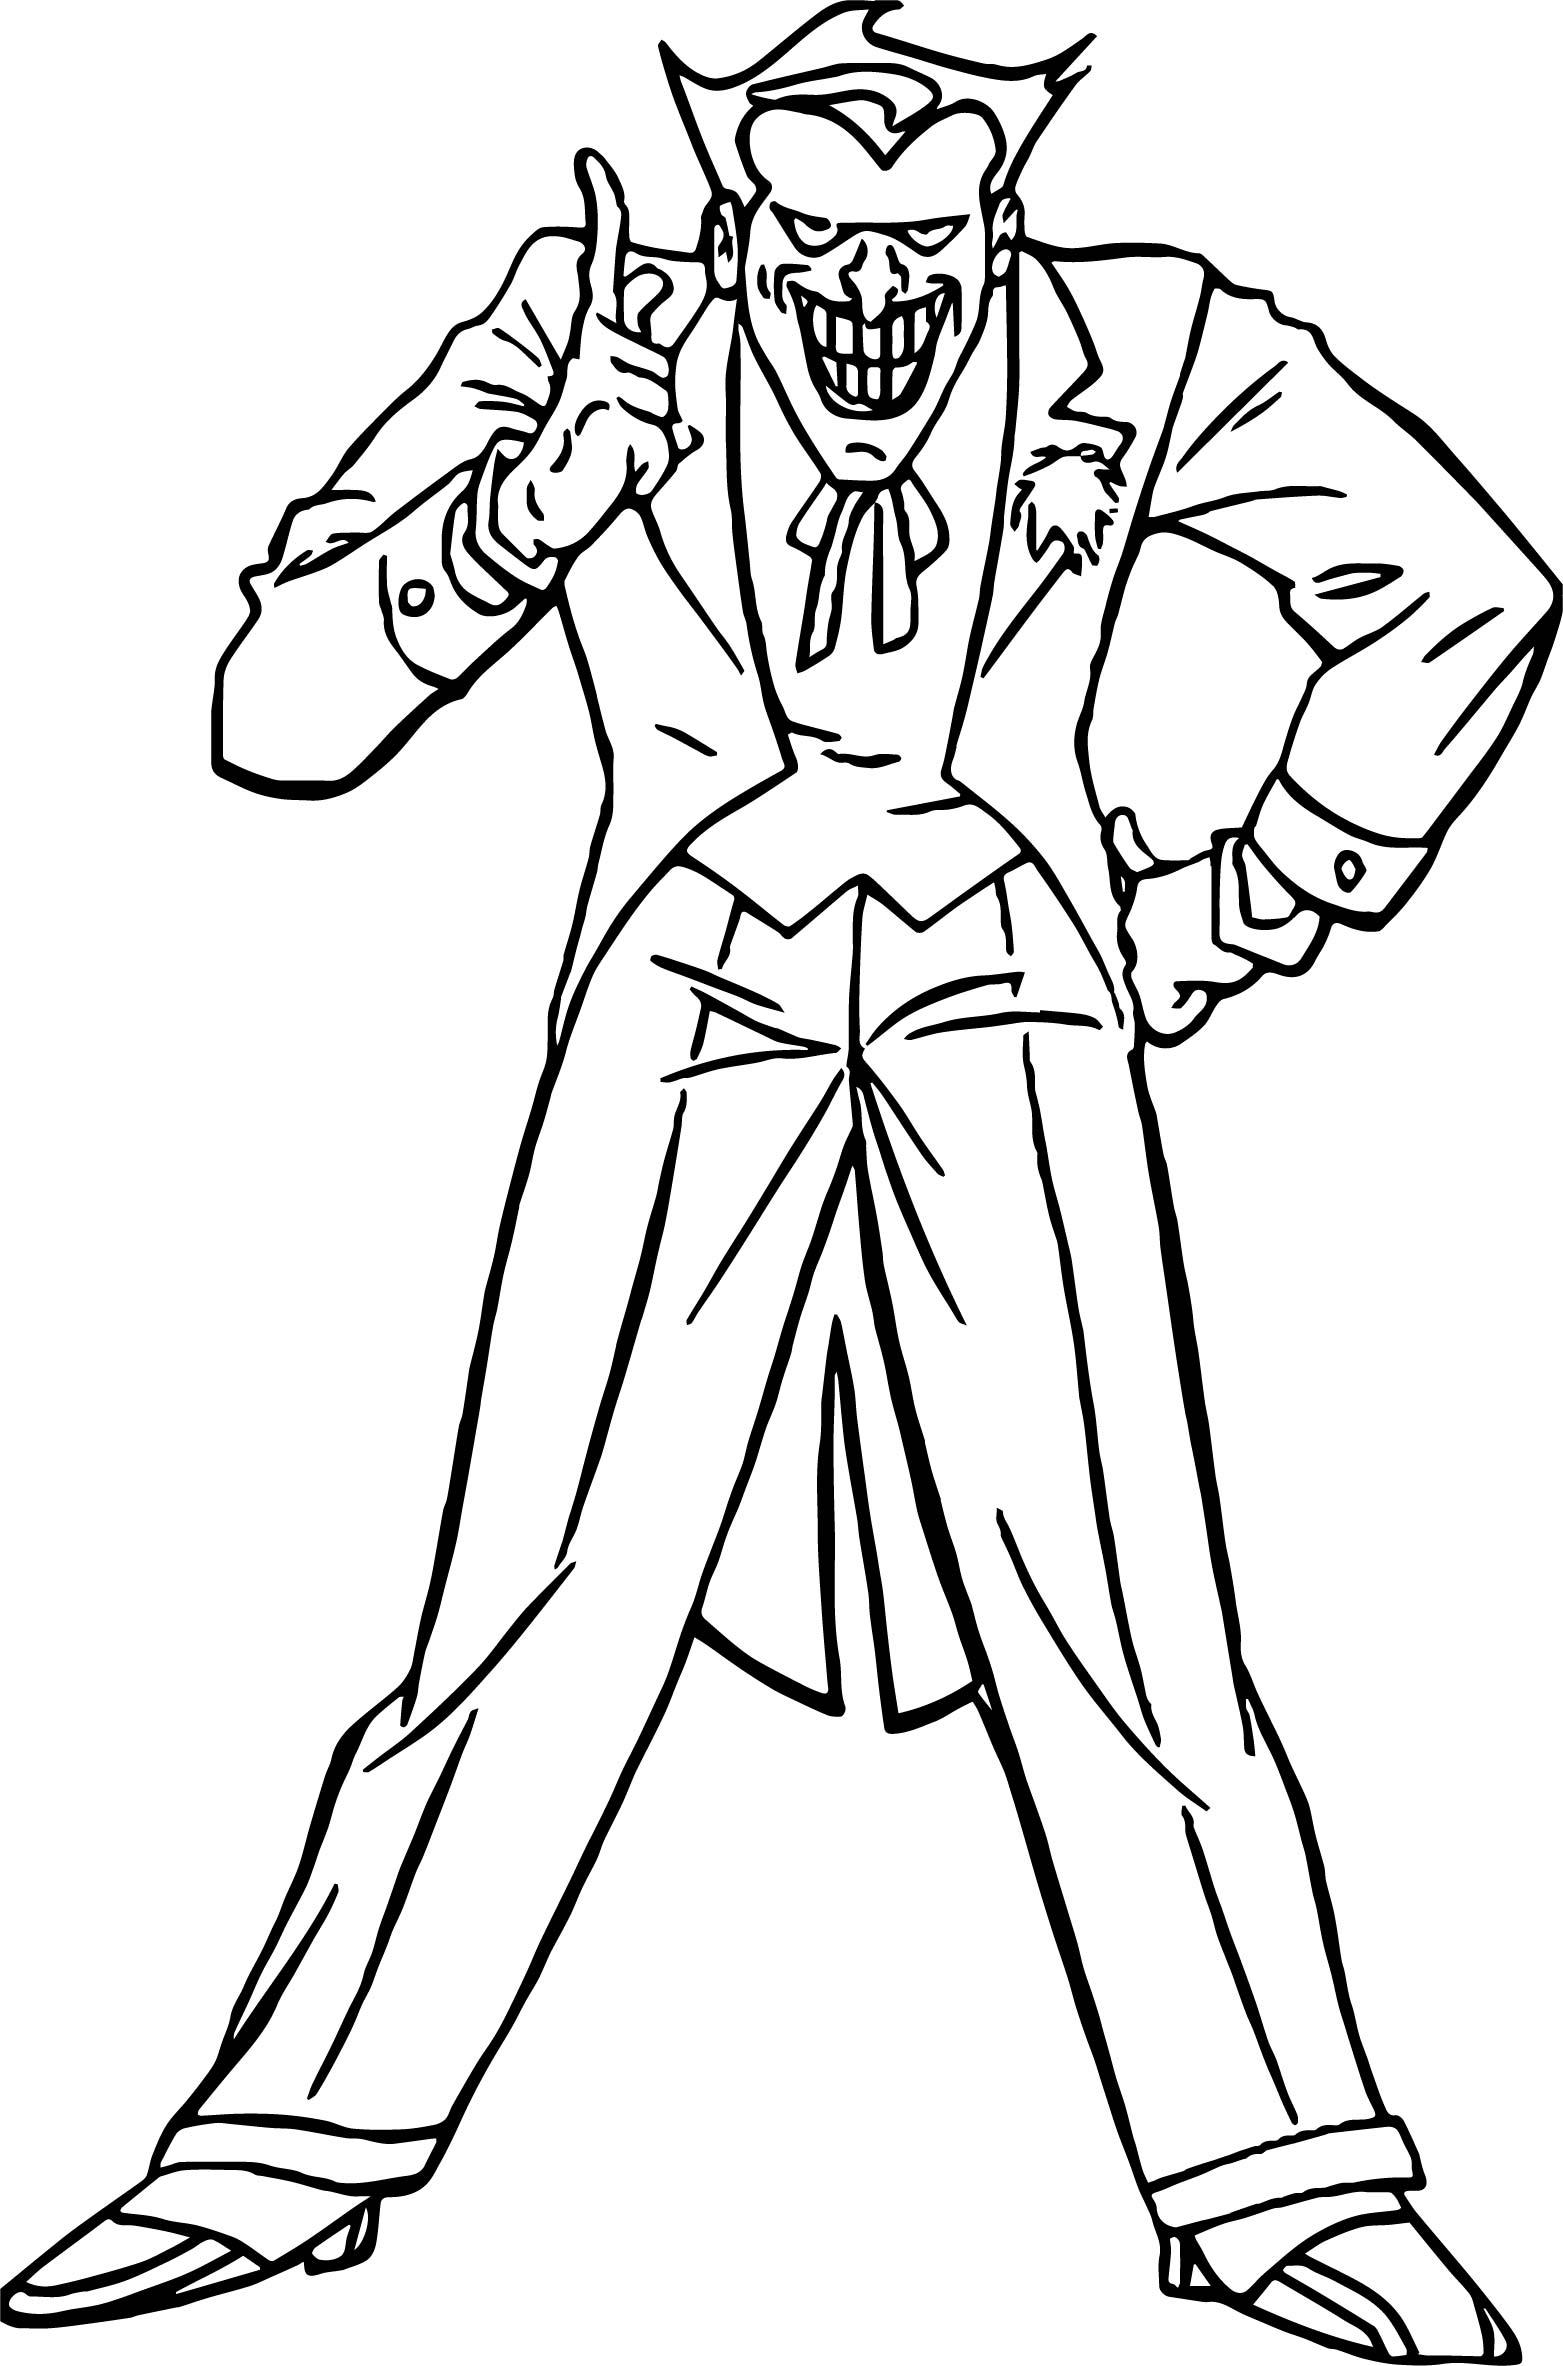 Joker From Batman Movie No No No Coloring Page